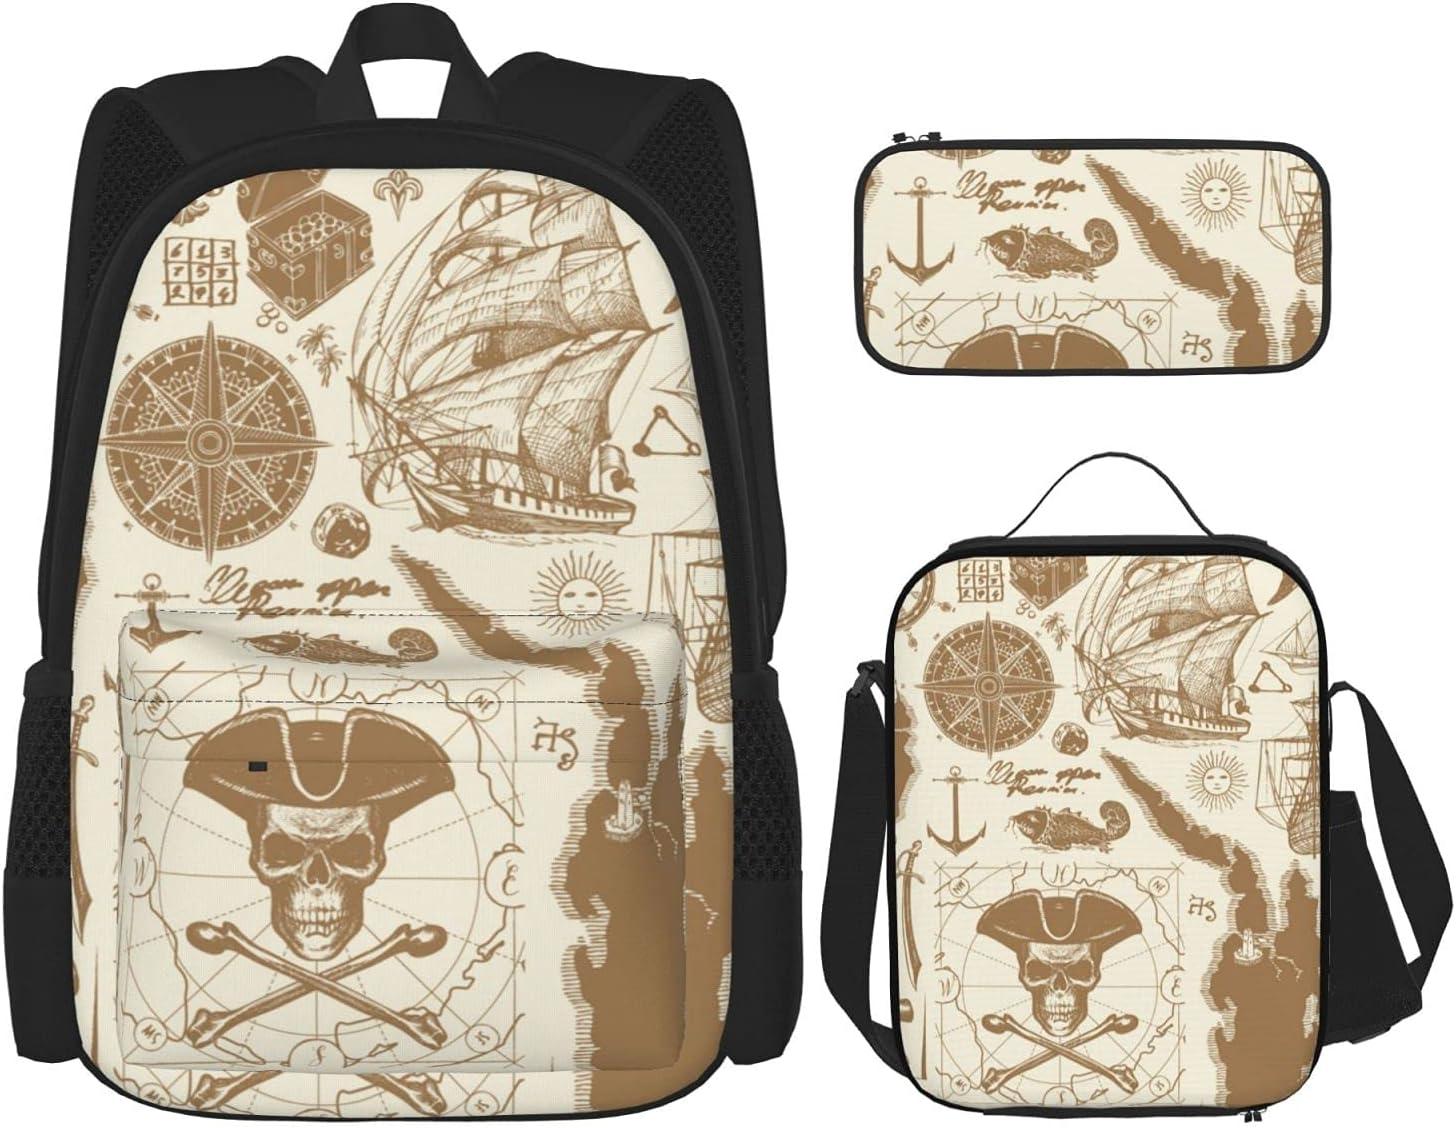 Skull Crossbones Pirate Flag Bookbags NEW Many popular brands School Sailboats Backpacks